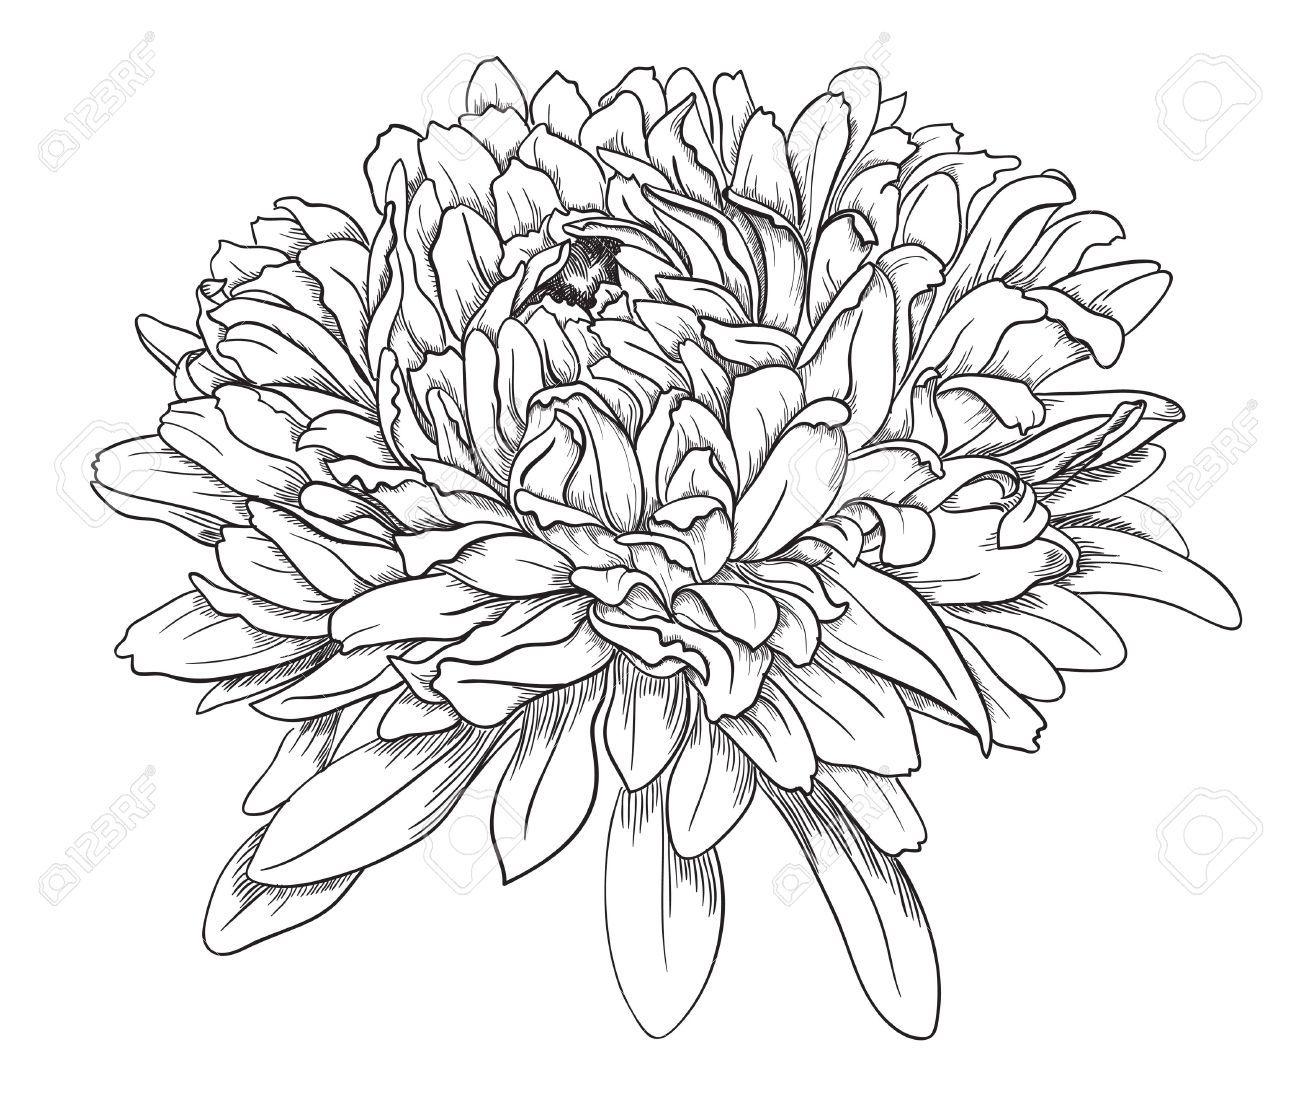 Idea by Elliot Chu on Ink Aster flower tattoos